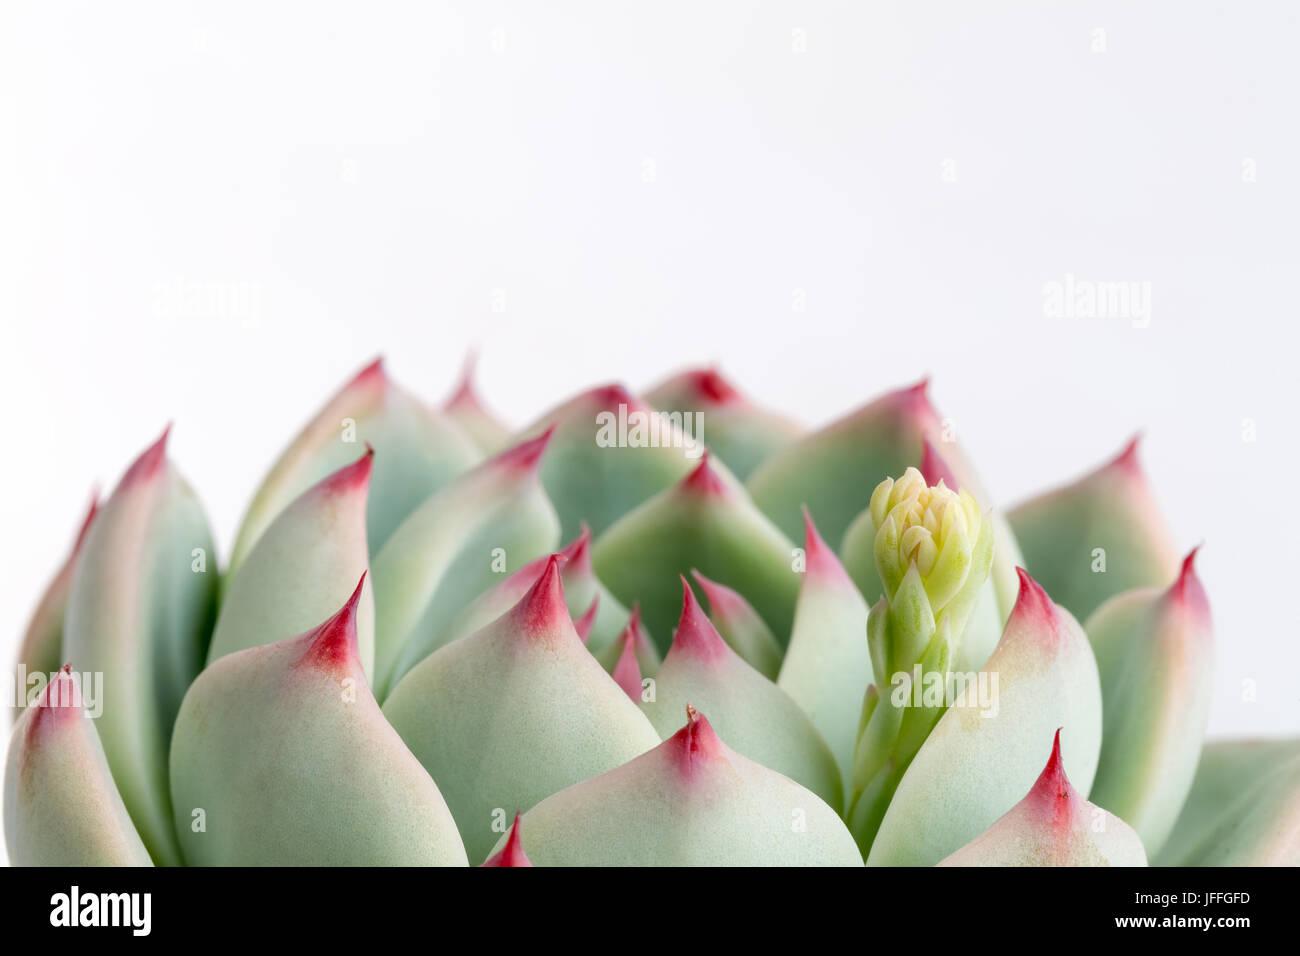 Piante succulente closeup Immagini Stock